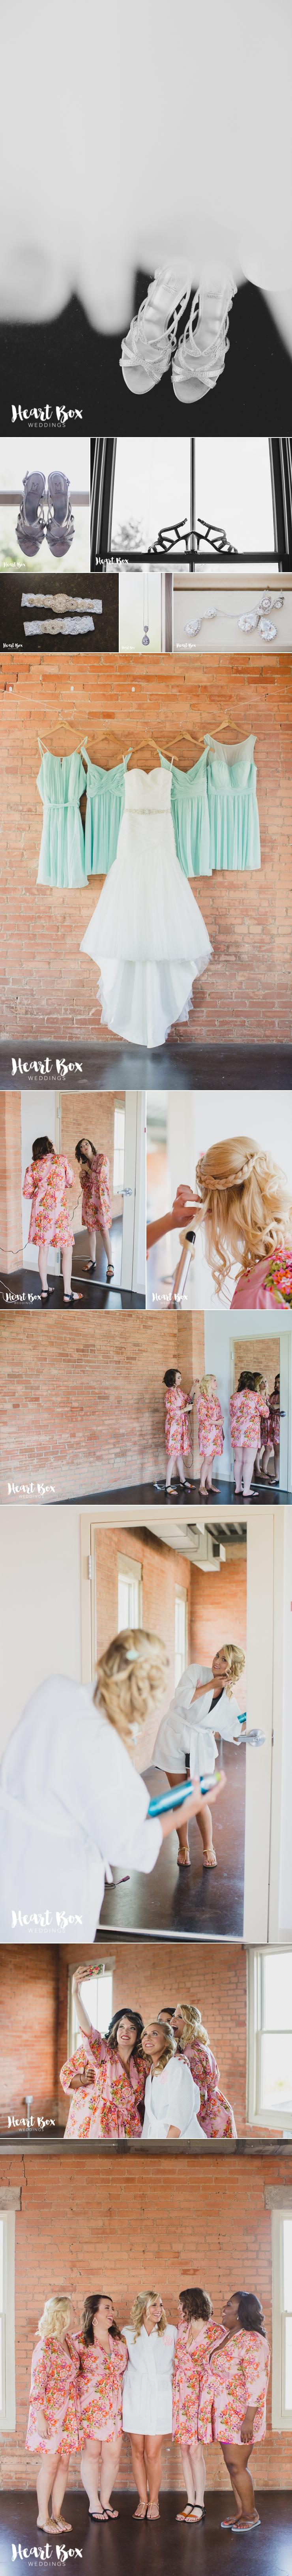 Gould Wedding Blog Collages 2.jpg